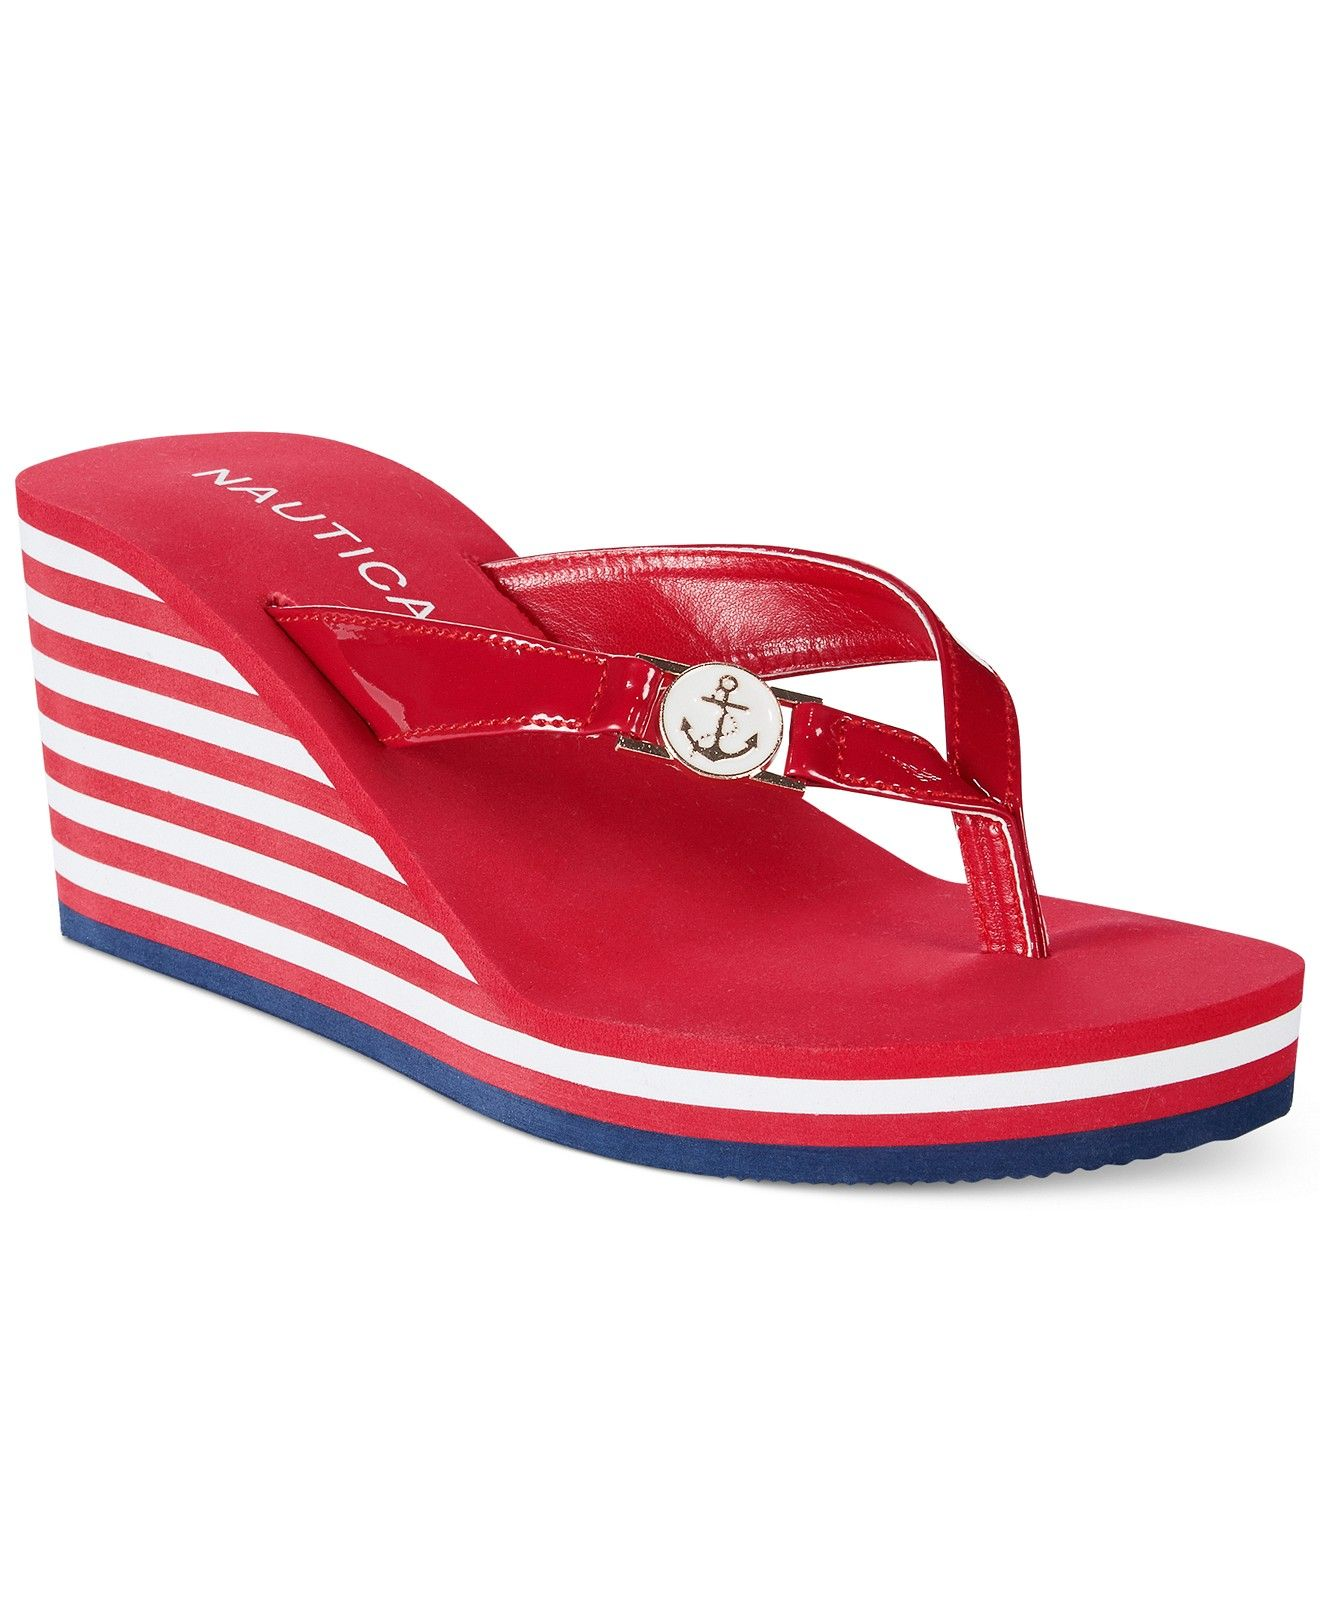 5b53e3e1567e Nautica Women s Landvale Eva Platform Wedge Flip Flops - All Women s Shoes  - Shoes - Macy s